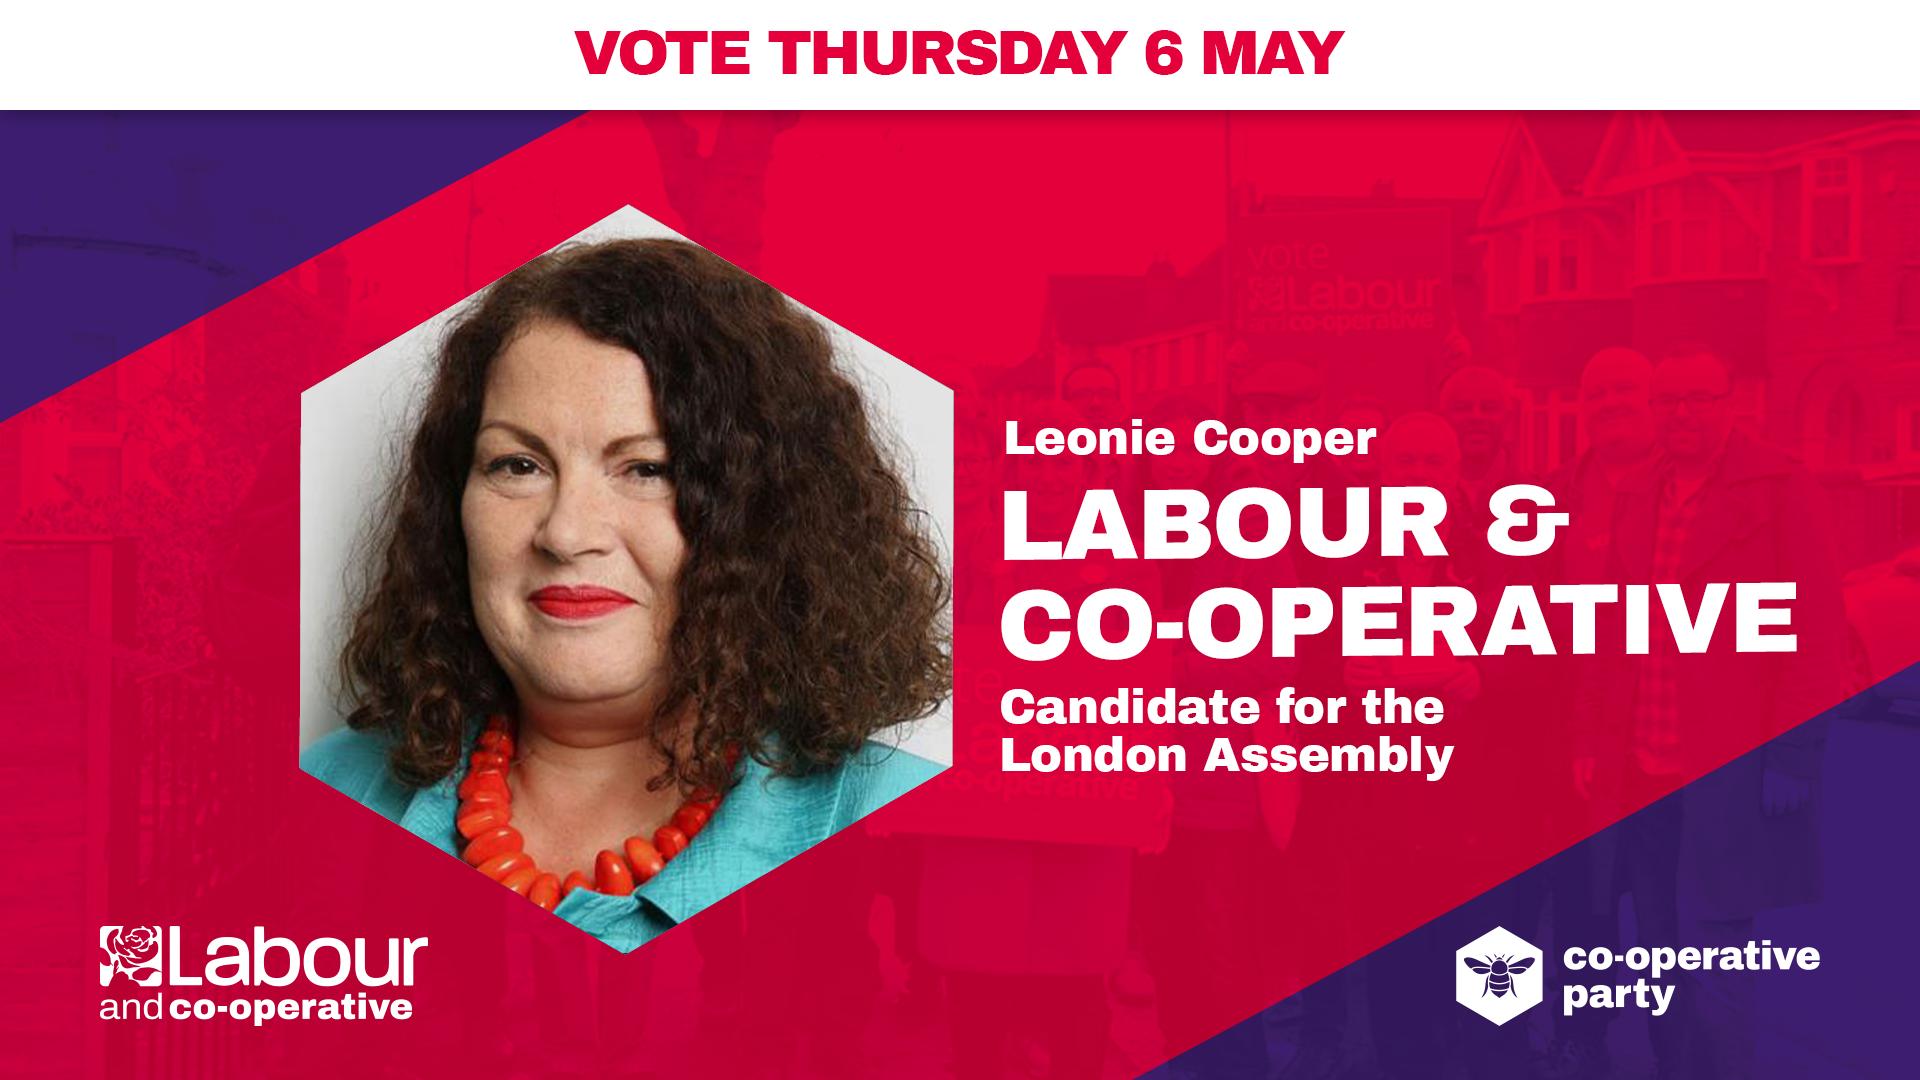 Leonie Cooper